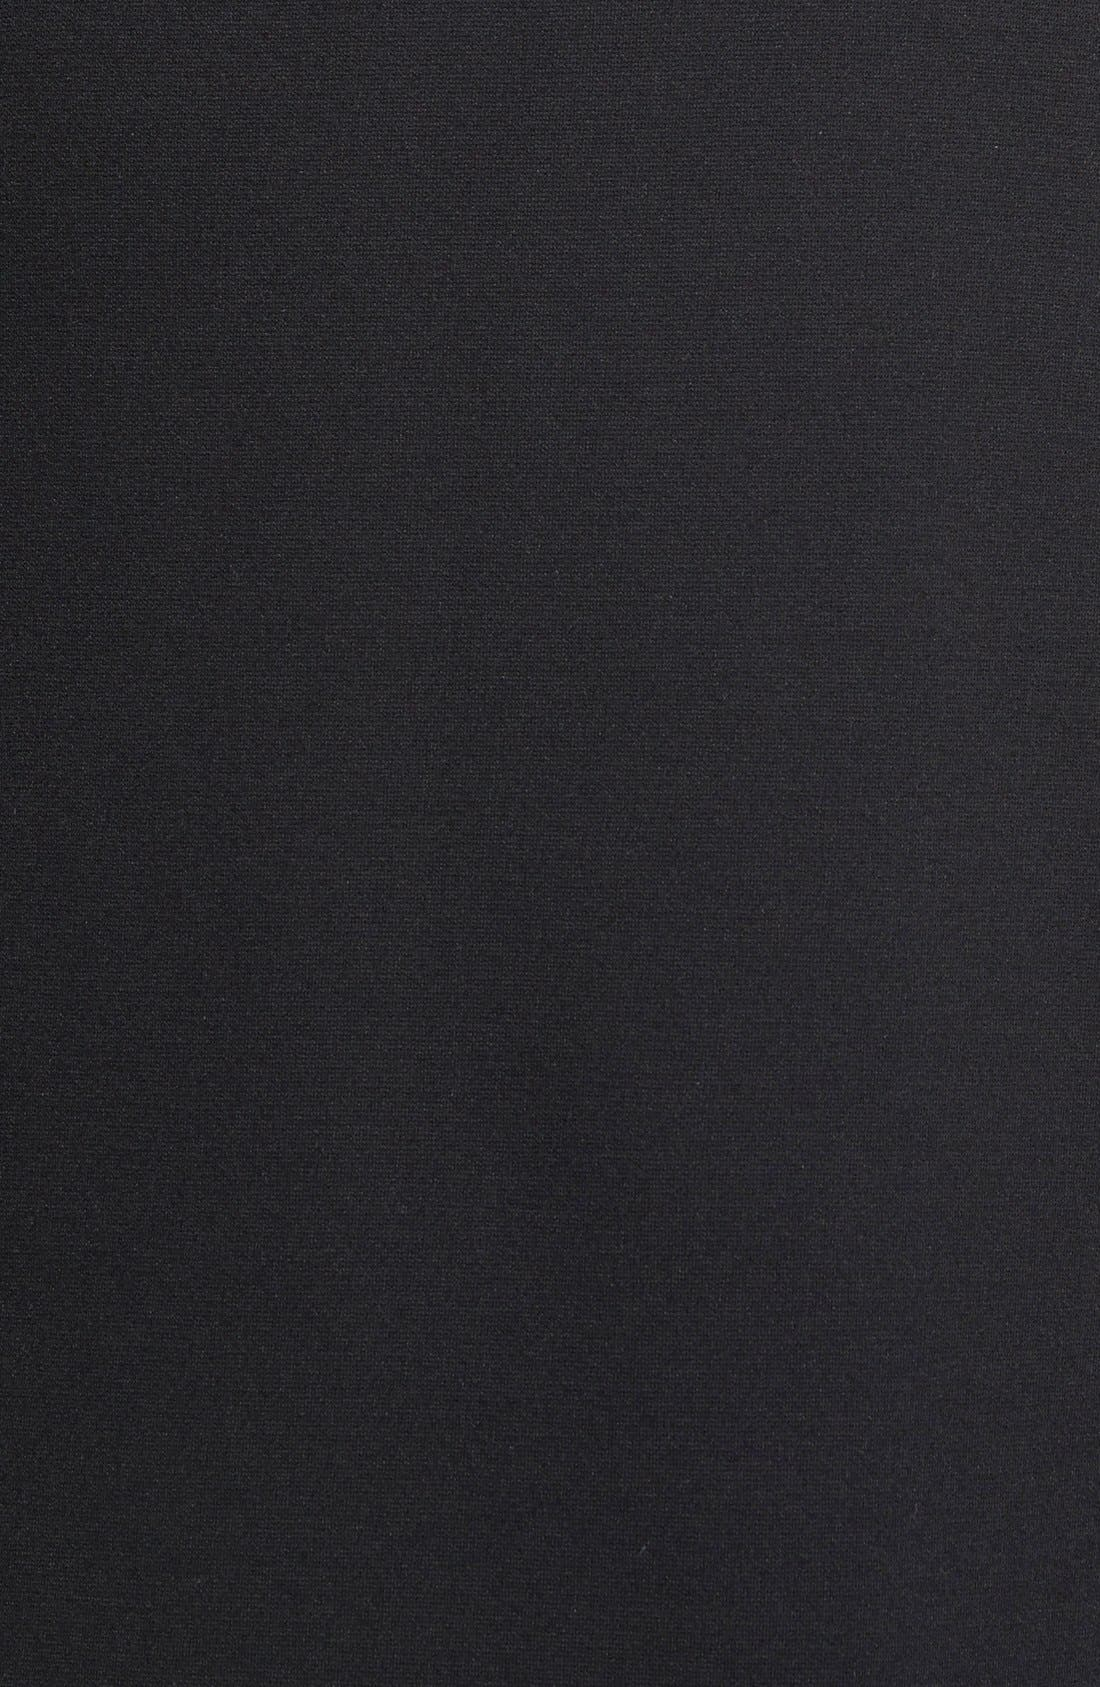 Alternate Image 3  - Eileen Fisher Ponte Knit Pencil Skirt (Plus)